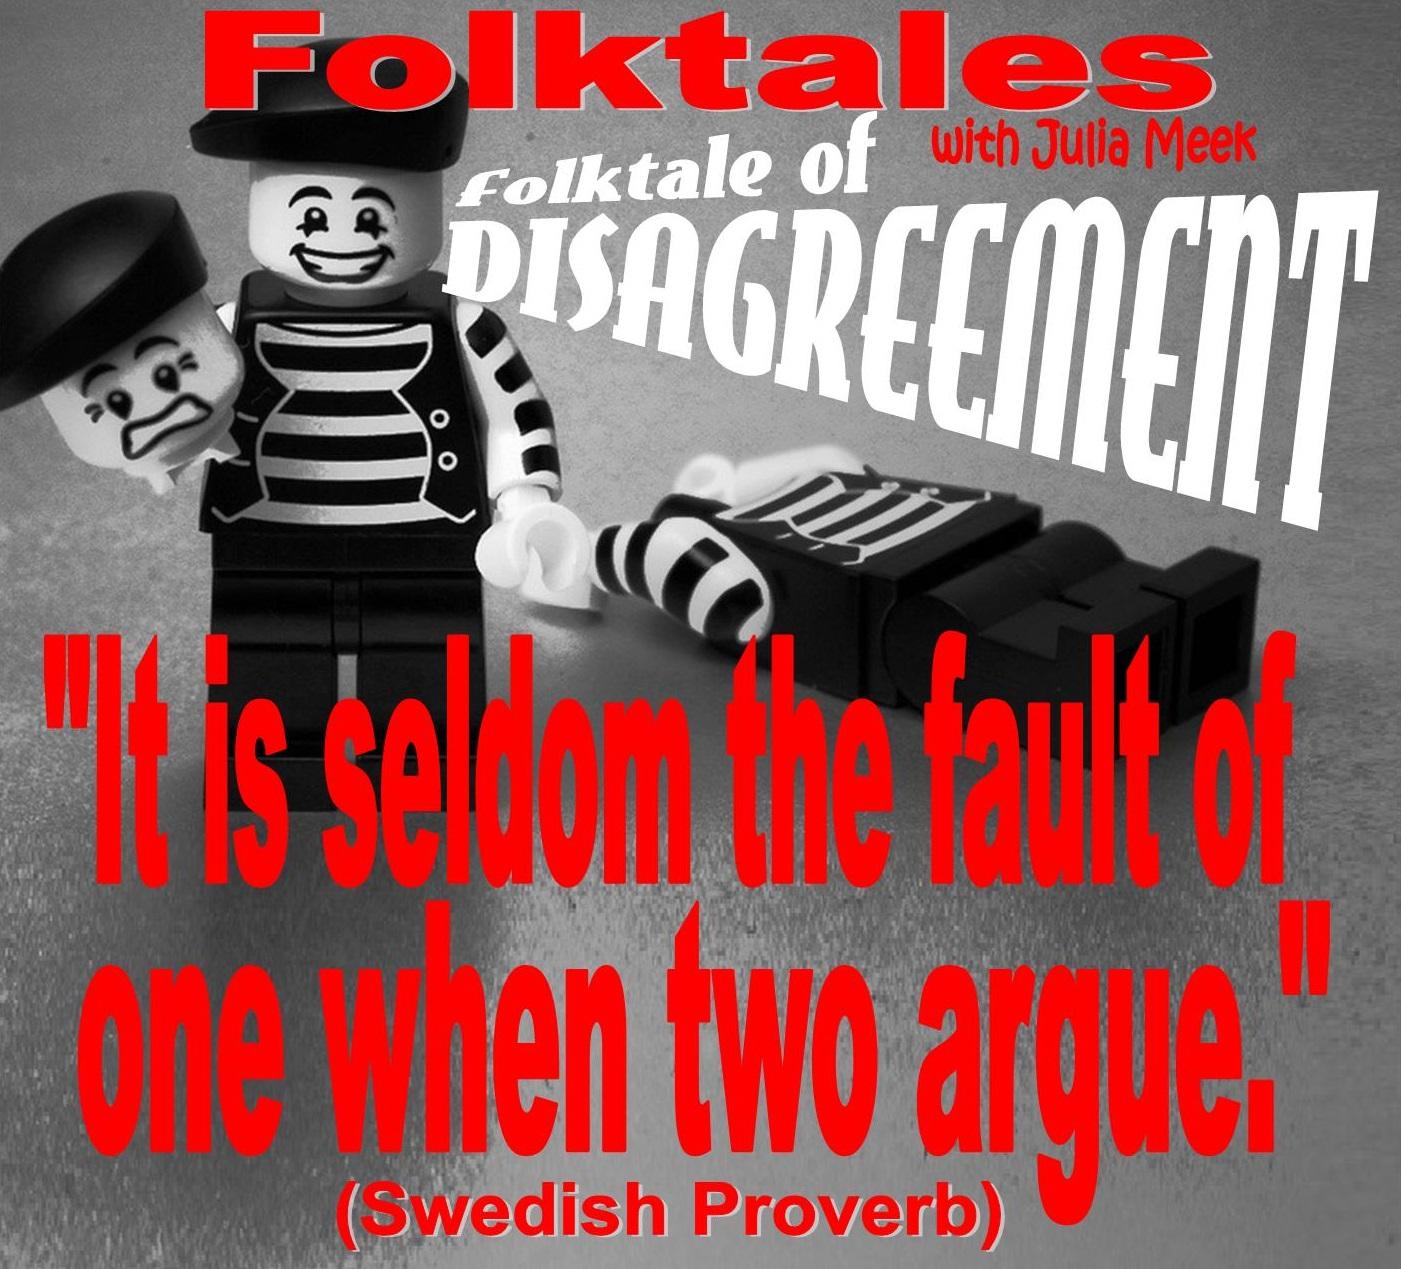 Caption: WBOI's Folkale of Disagreement, Credit: Julia Meek